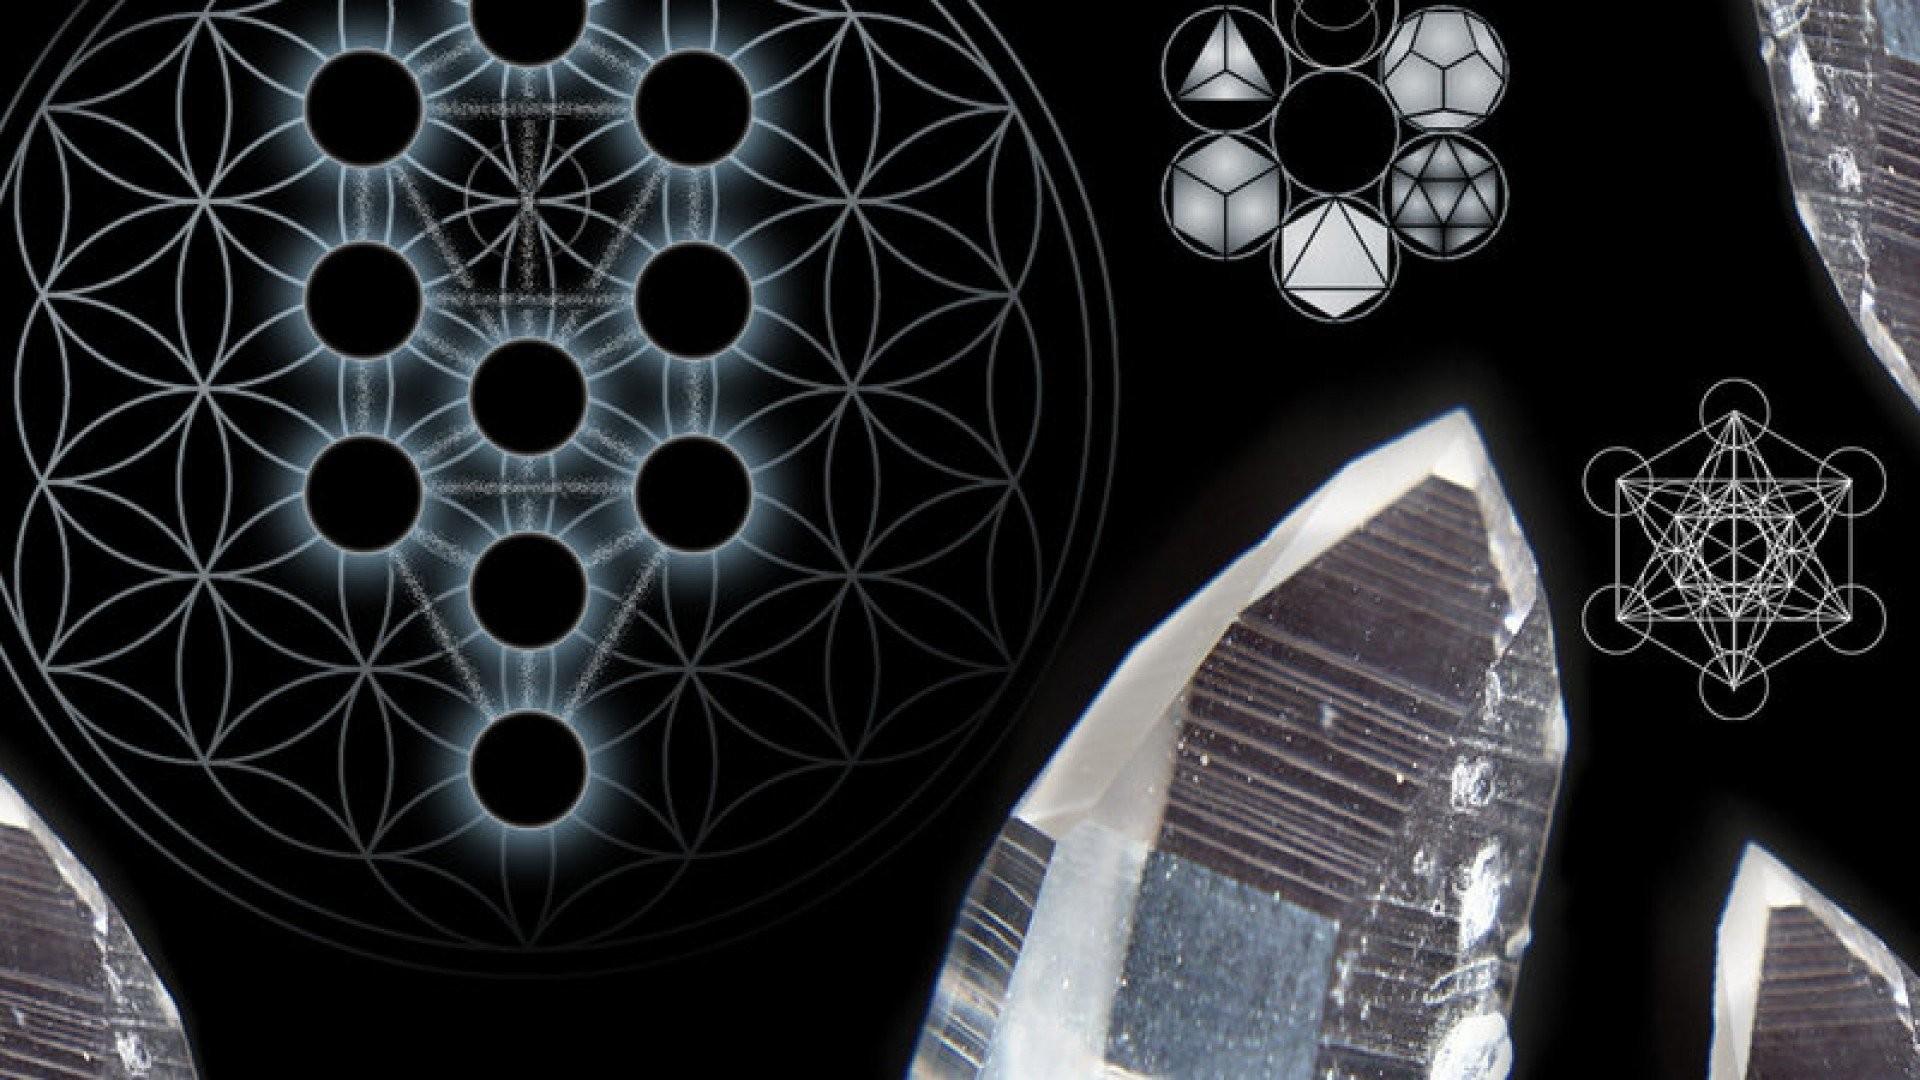 Sacred Geometry Wallpaper HD (65+ images)